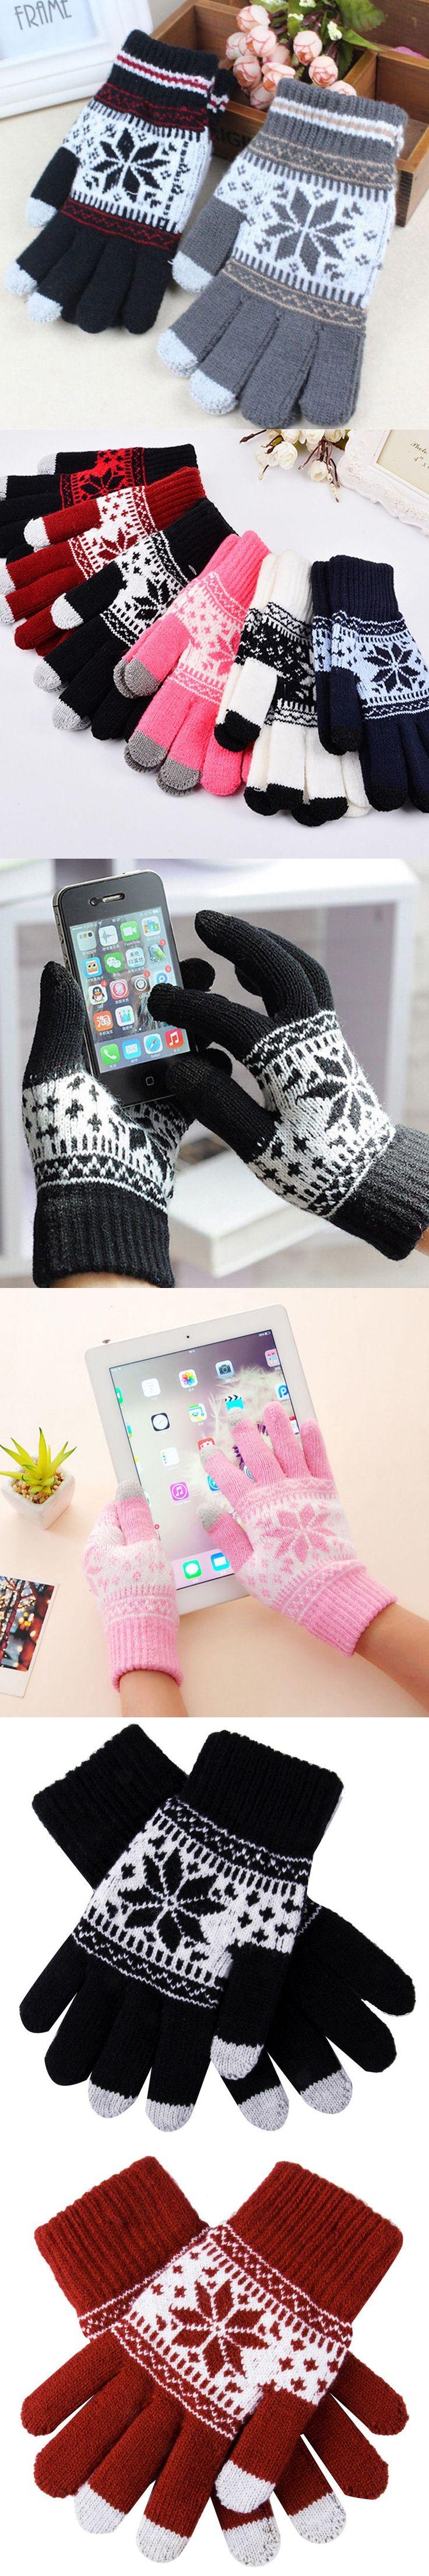 Warm Winter Gloves Knitted Touch Gloves Men Women Gloves Touch Screen Glove Party Supplies Women